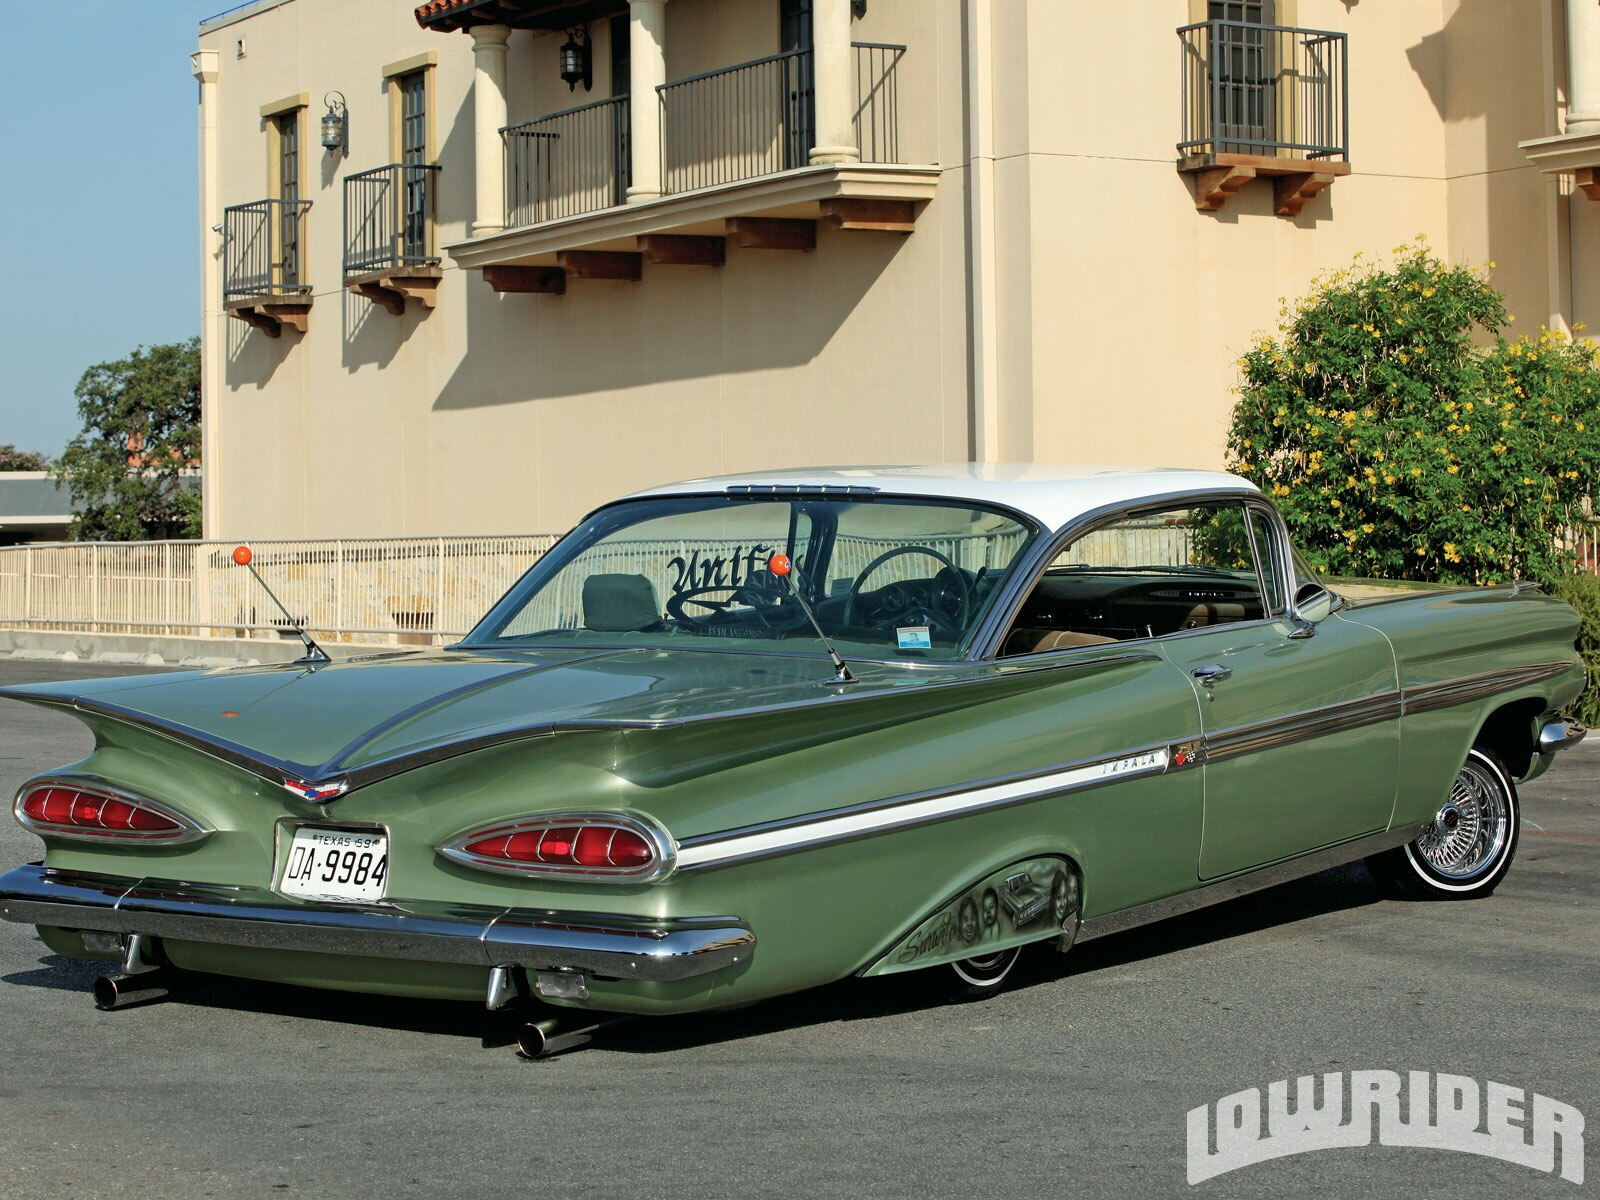 Lowrider Miami >> 1959 Chevrolet Impala - Lowrider Magazine